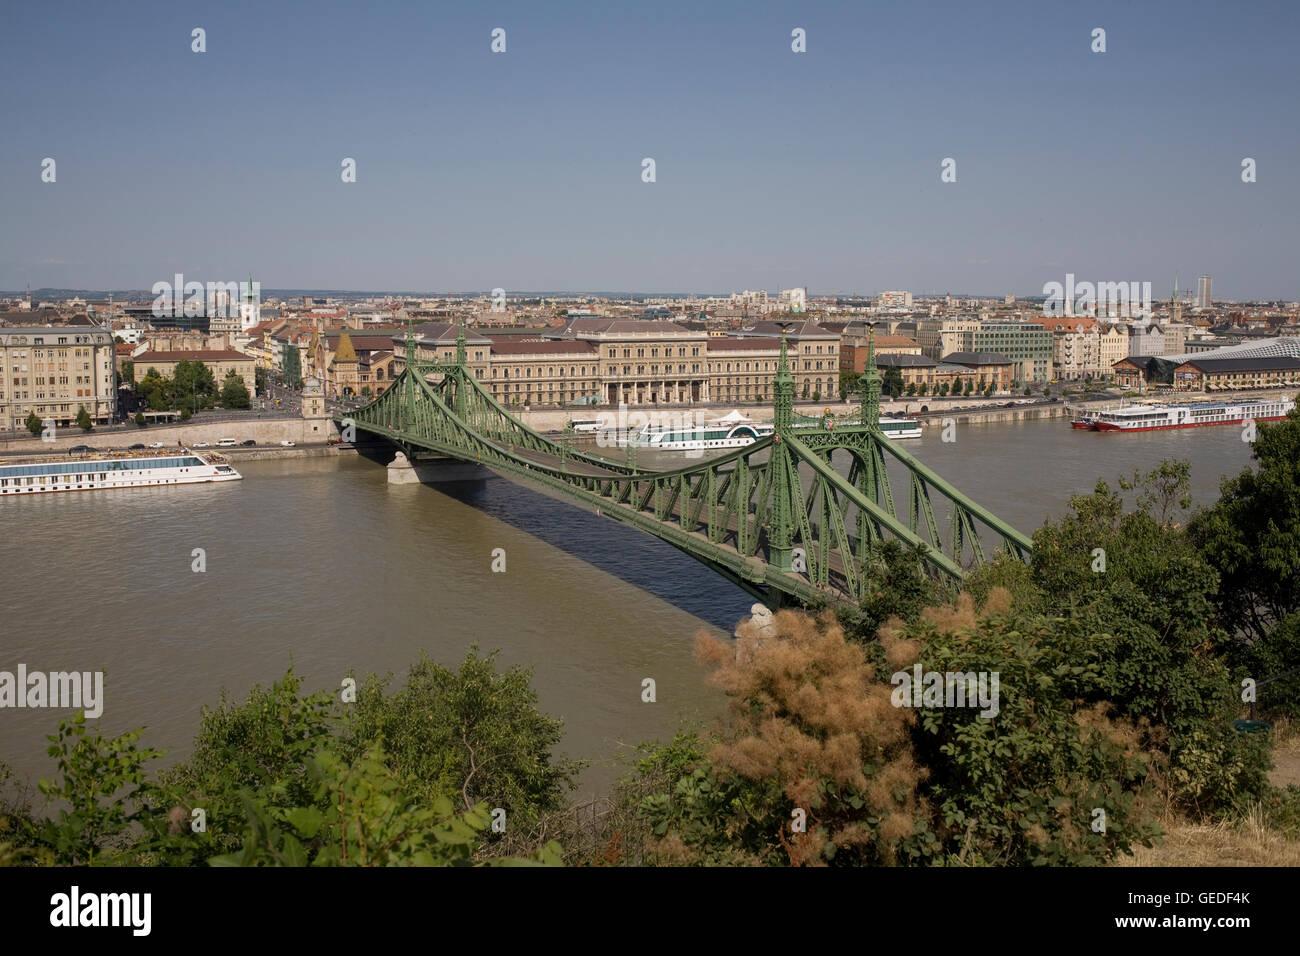 Liberty bridge on glorious summer afternoon - Stock Image